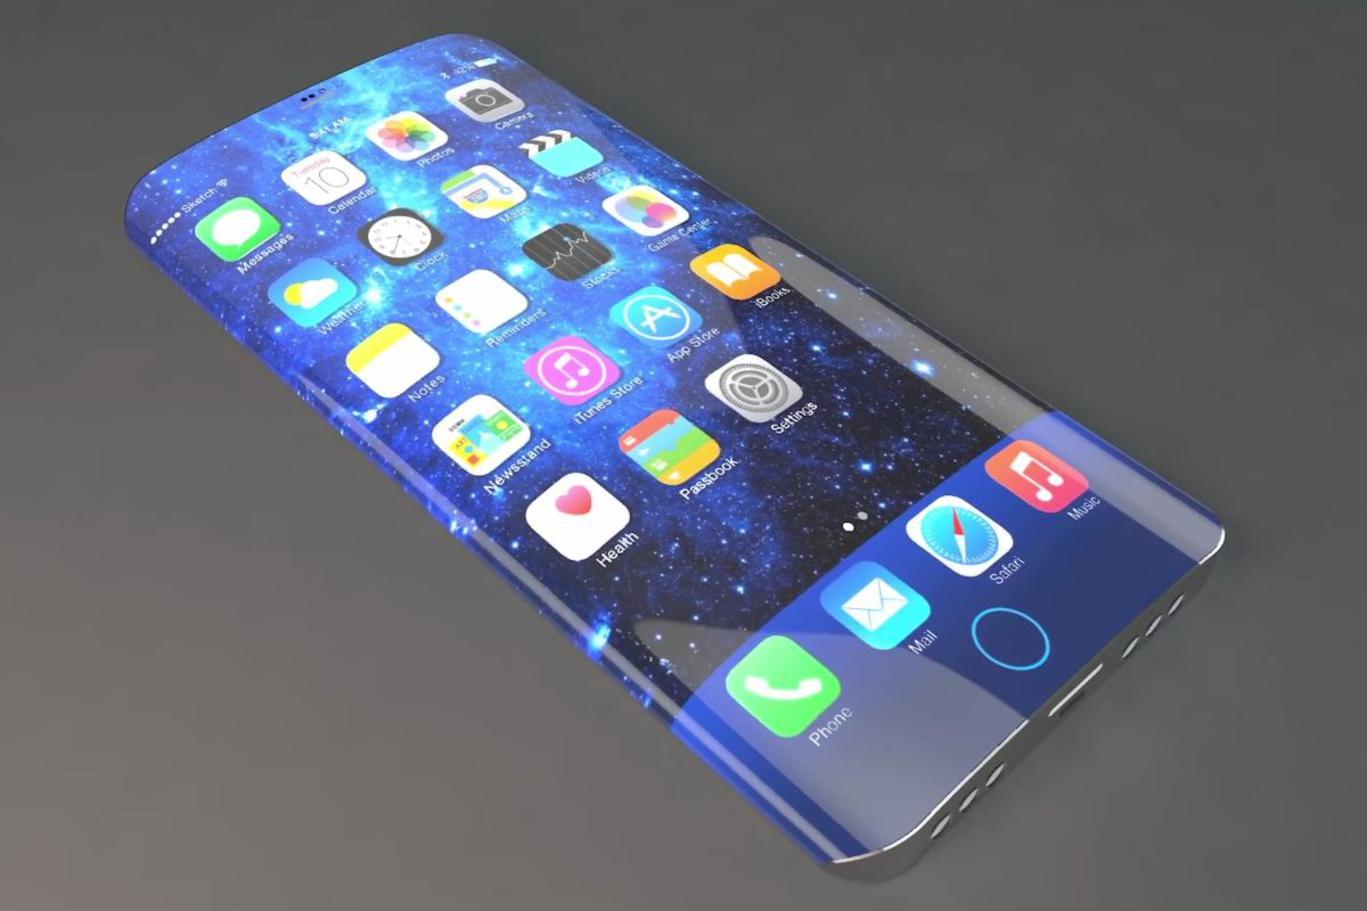 Ini ada gambar dan video penampakan Iphone 7 dari Apple yang belakangan  beredar di internet. Iphone 7 ini menurut banyak analis teknologi akan  diluncurkan ... 2553238cf5